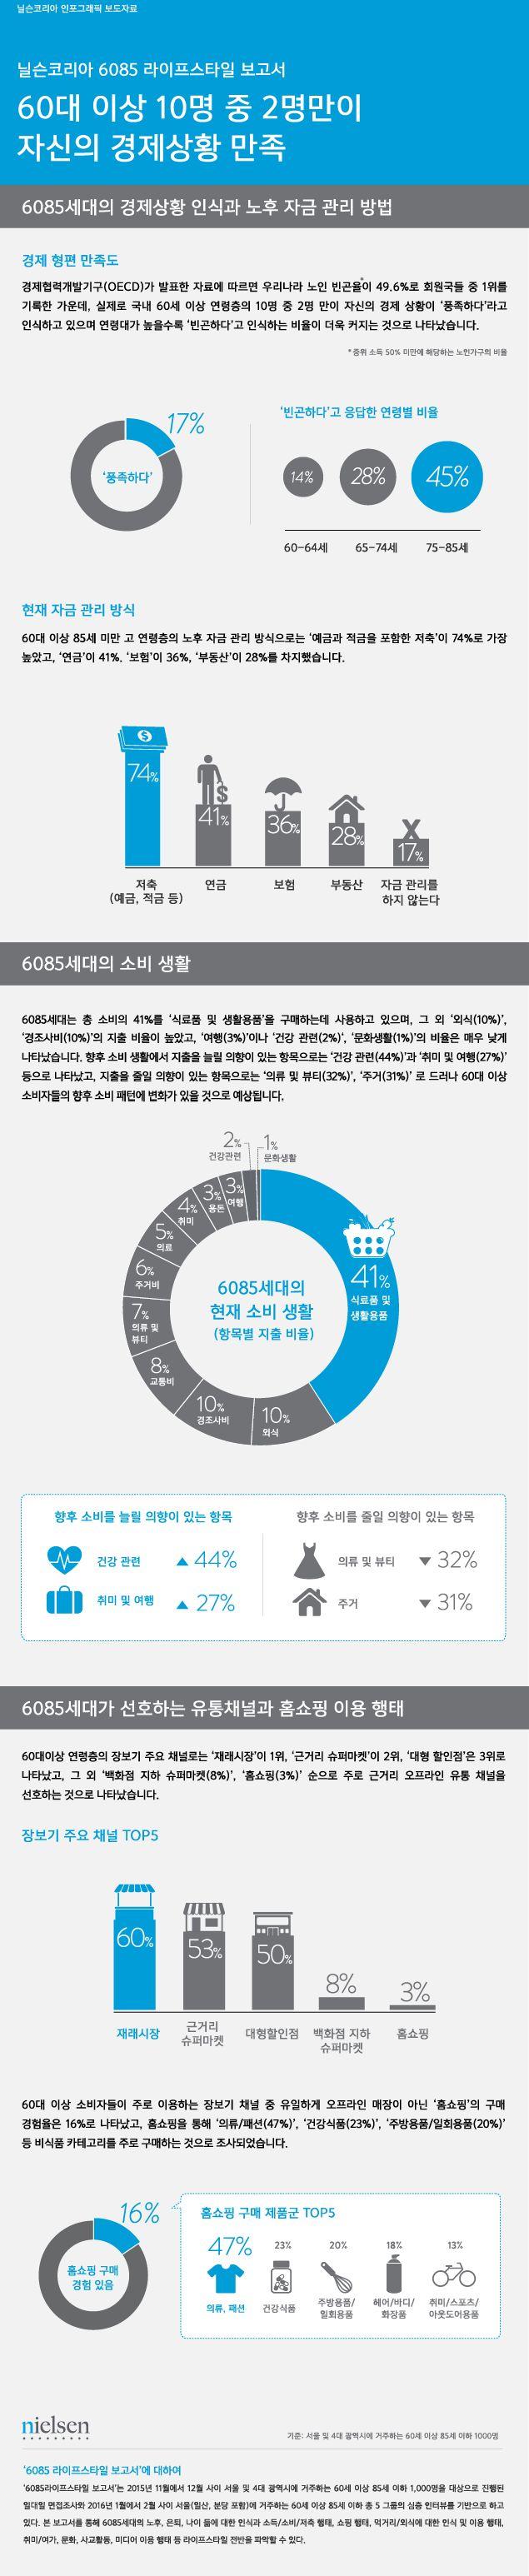 [Nielsen Korea Infographic] 닐슨코리아, 6085 라이프스타일 보고서 발간  #infographic #lifestyle #닐슨코리아 #인포그래픽 #라이프스타일 #실버세대 #시니어소비자